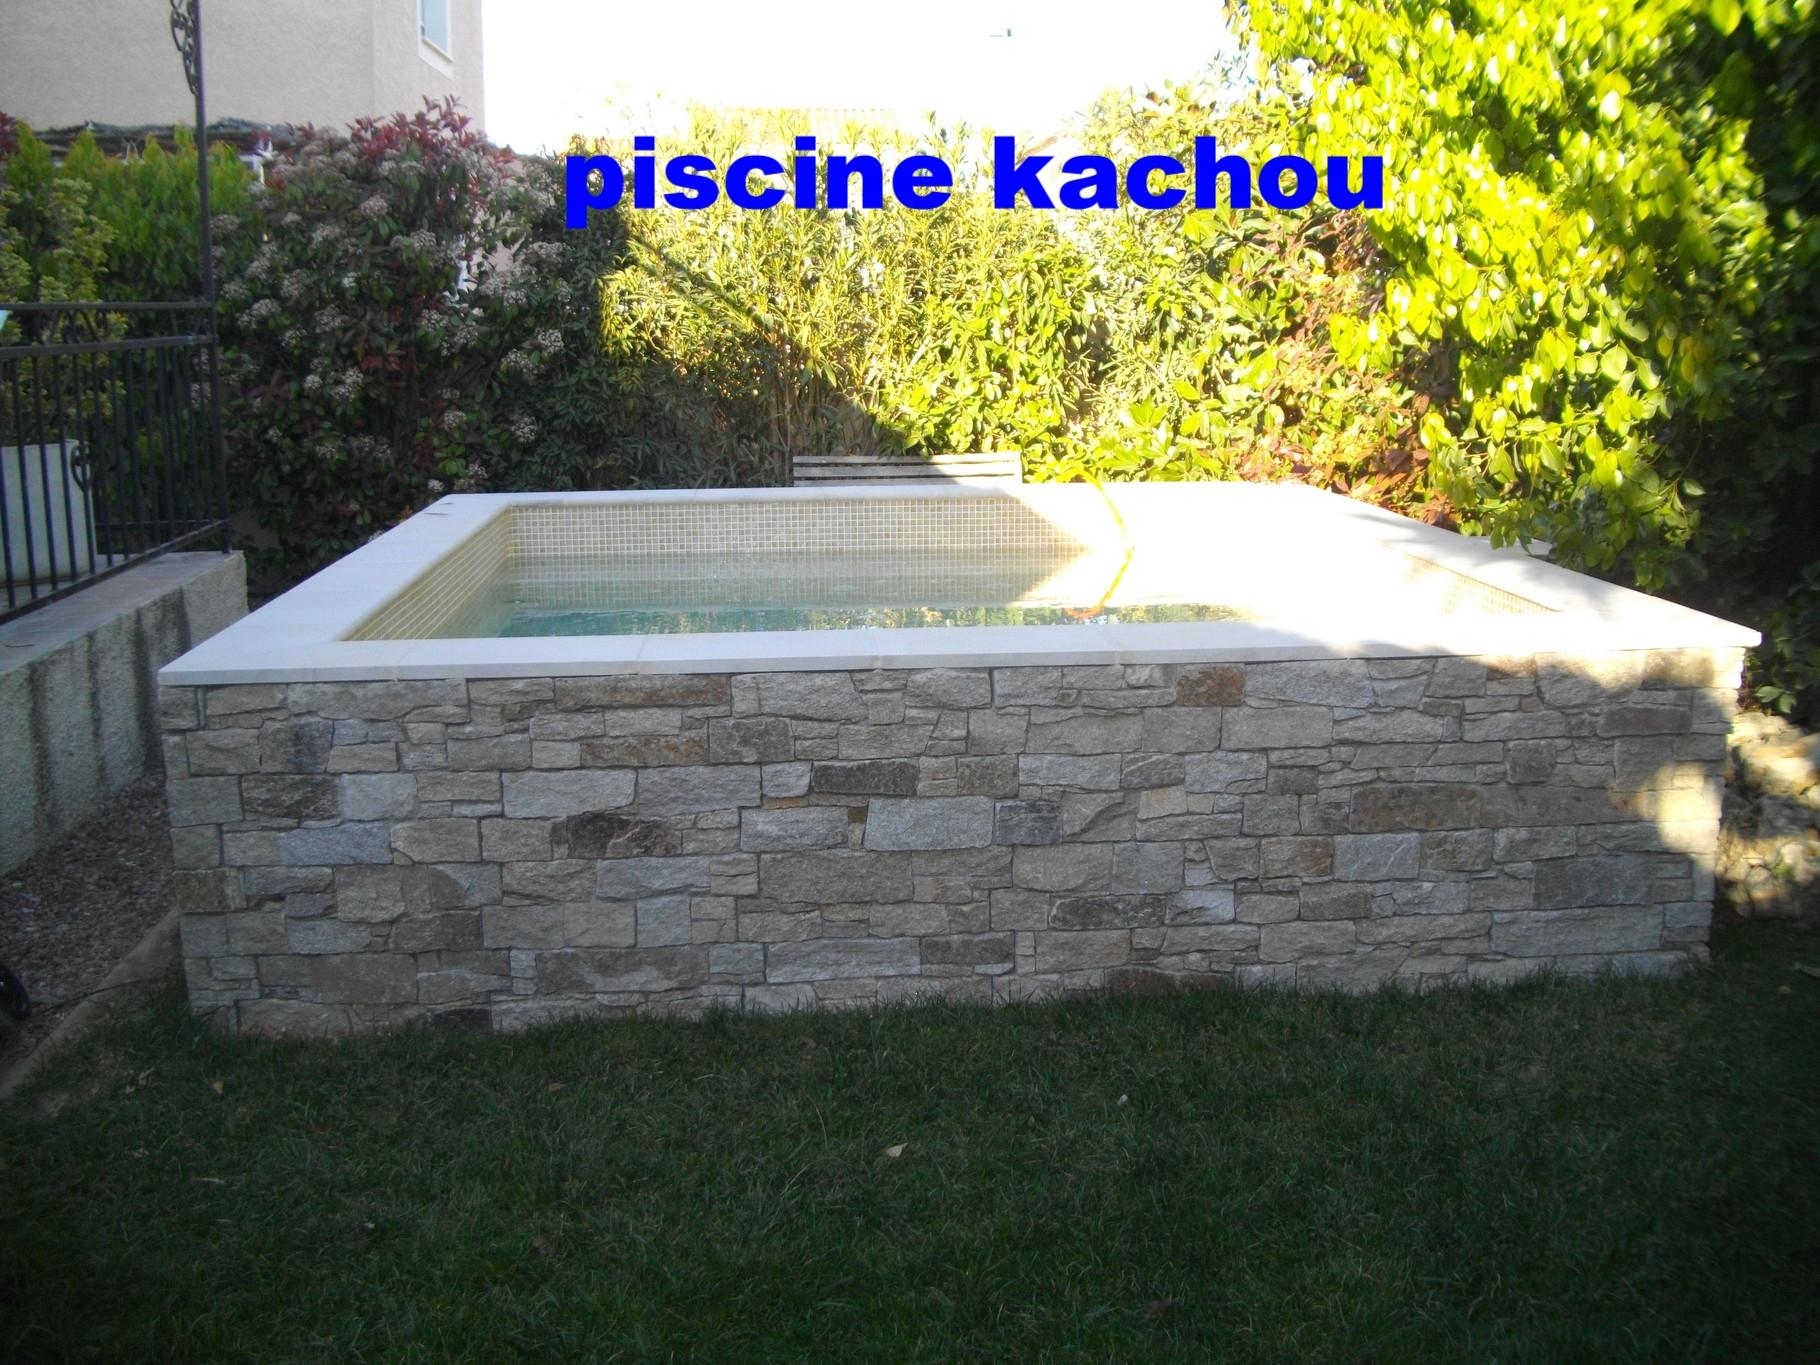 www.piscne kachou